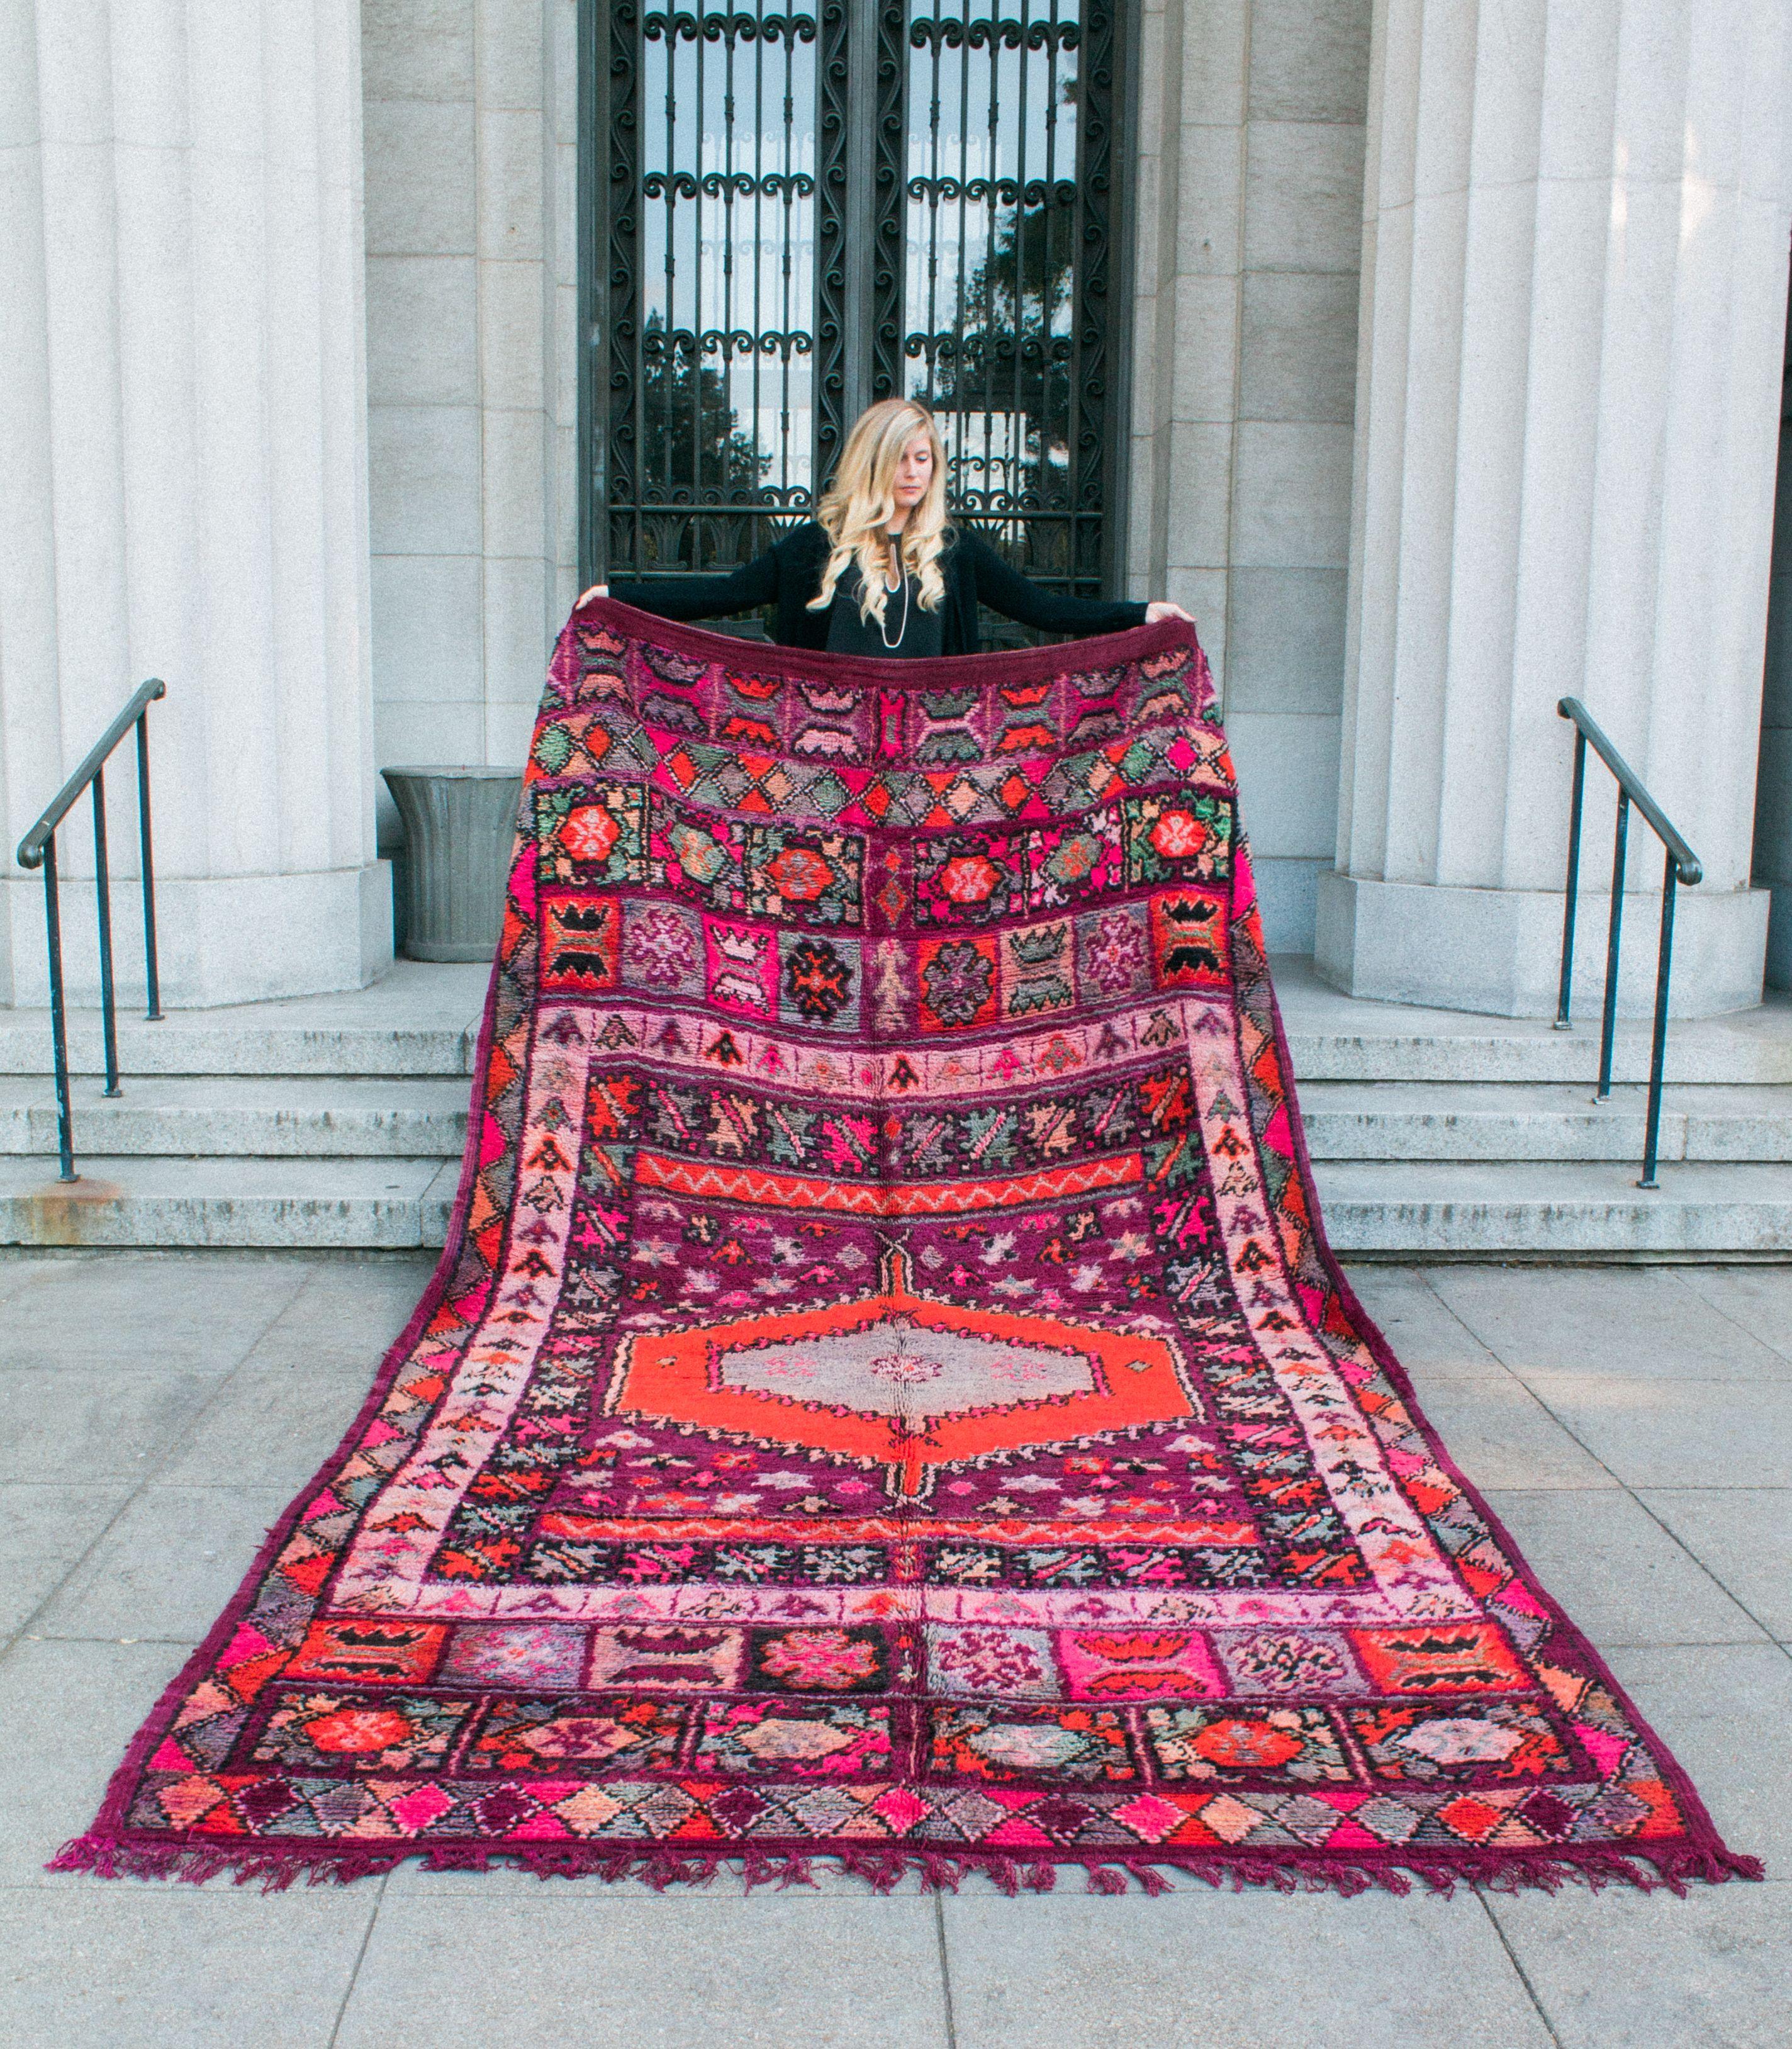 Moroccan Rug Boujad Unique Wool Rug With Colorful Orange Purple